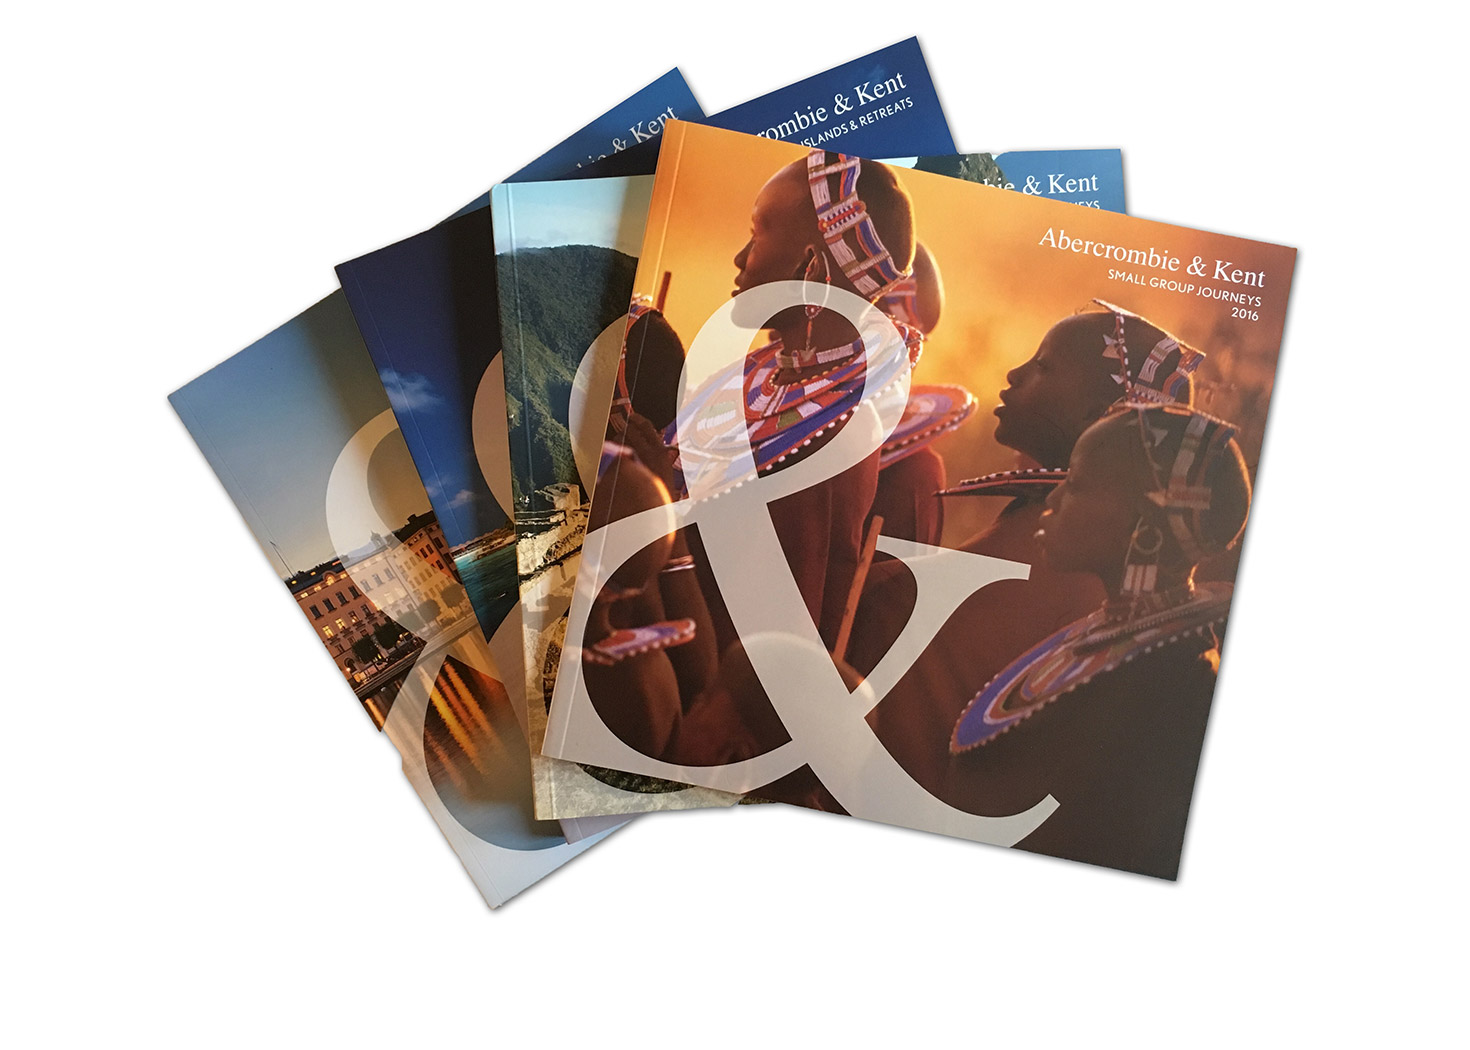 A&K travel brochures